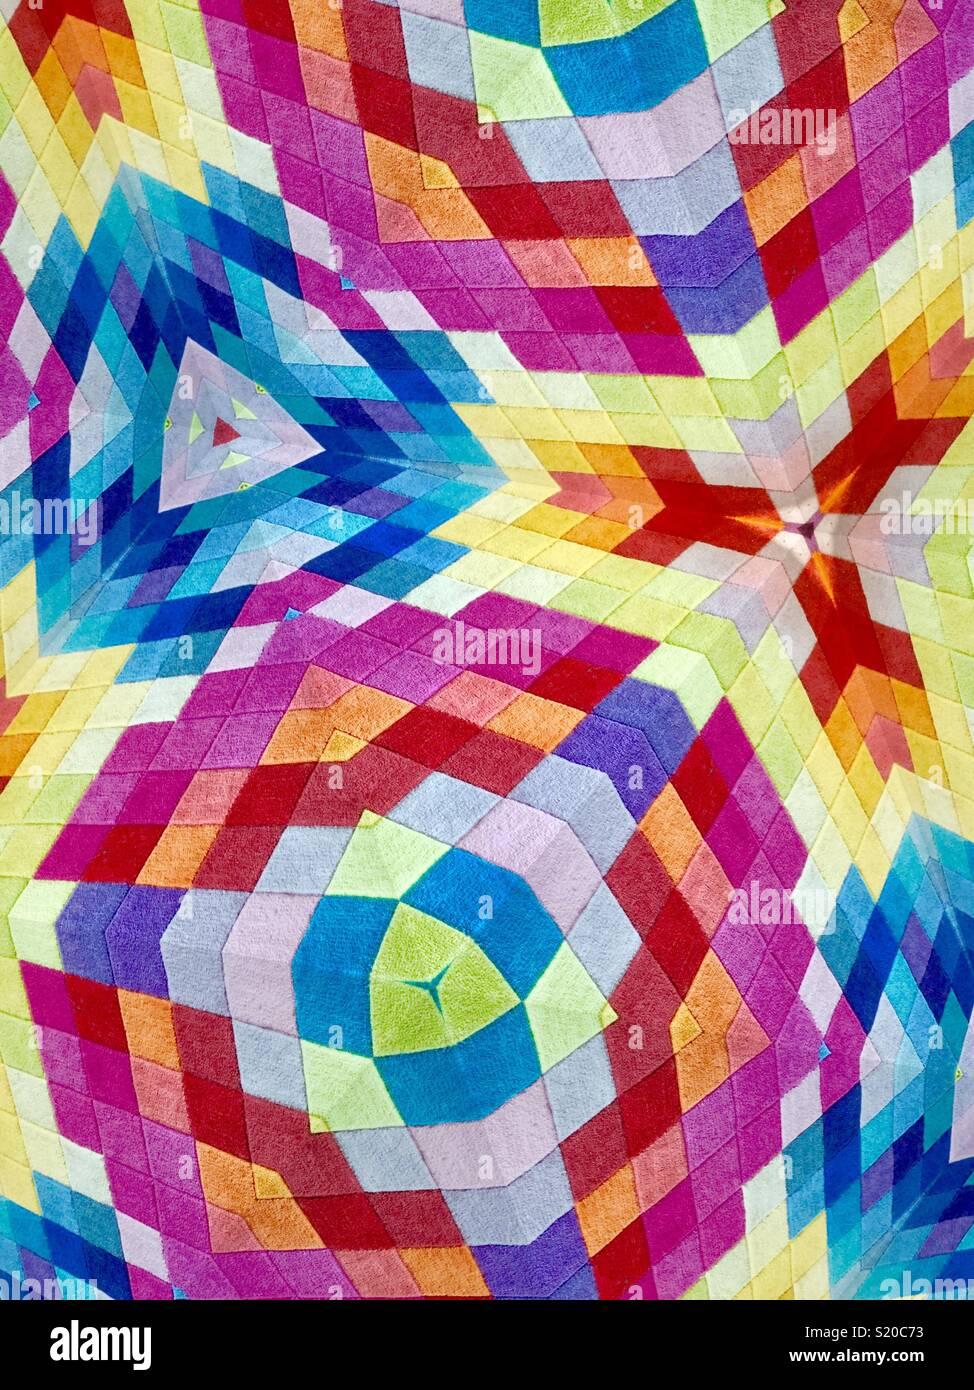 Mosaico tridimensional Imagen De Stock